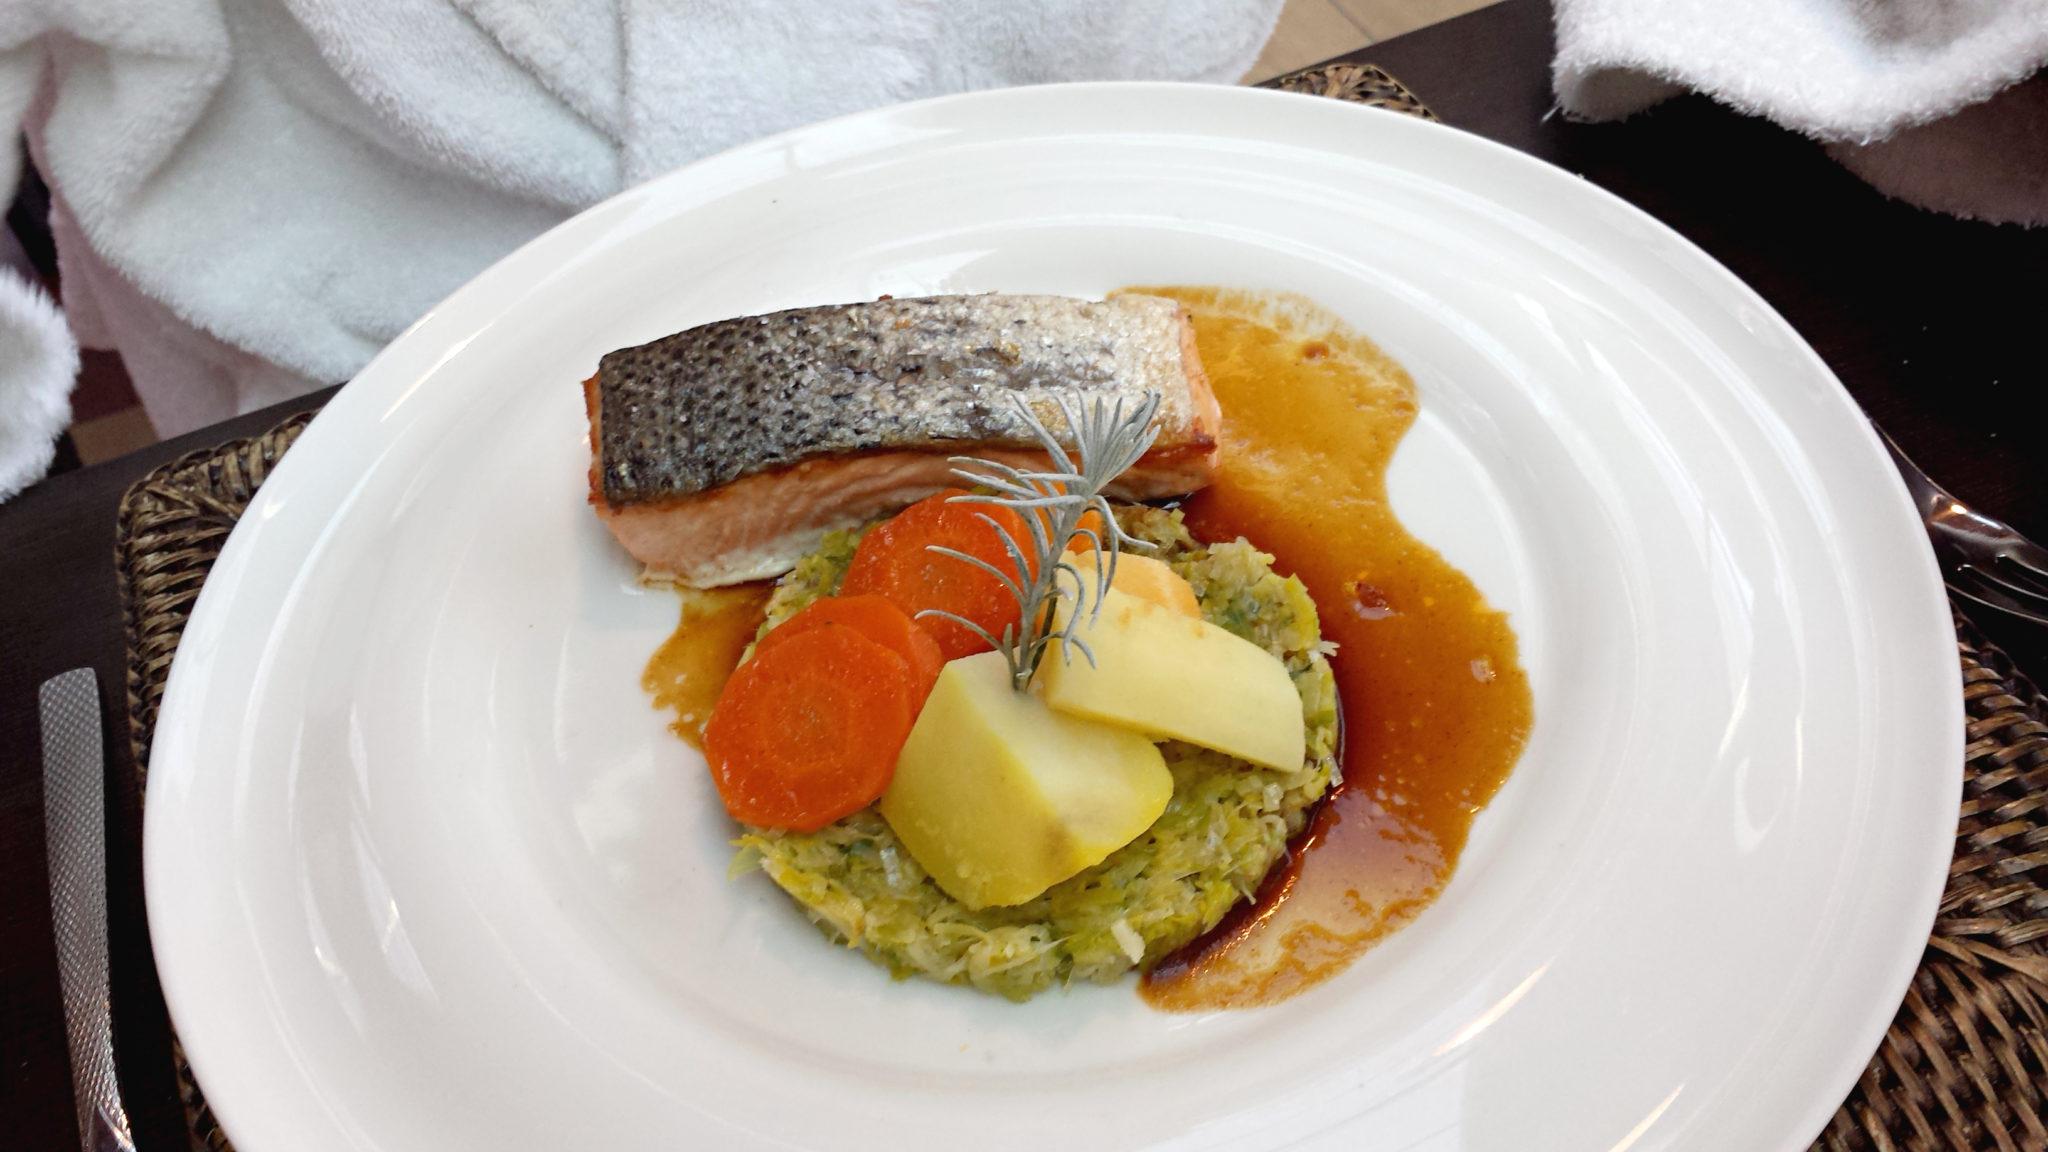 Journee_cocooning_aixenprovence_thermes_sextius_restaurant_orangerie_plat_saumon